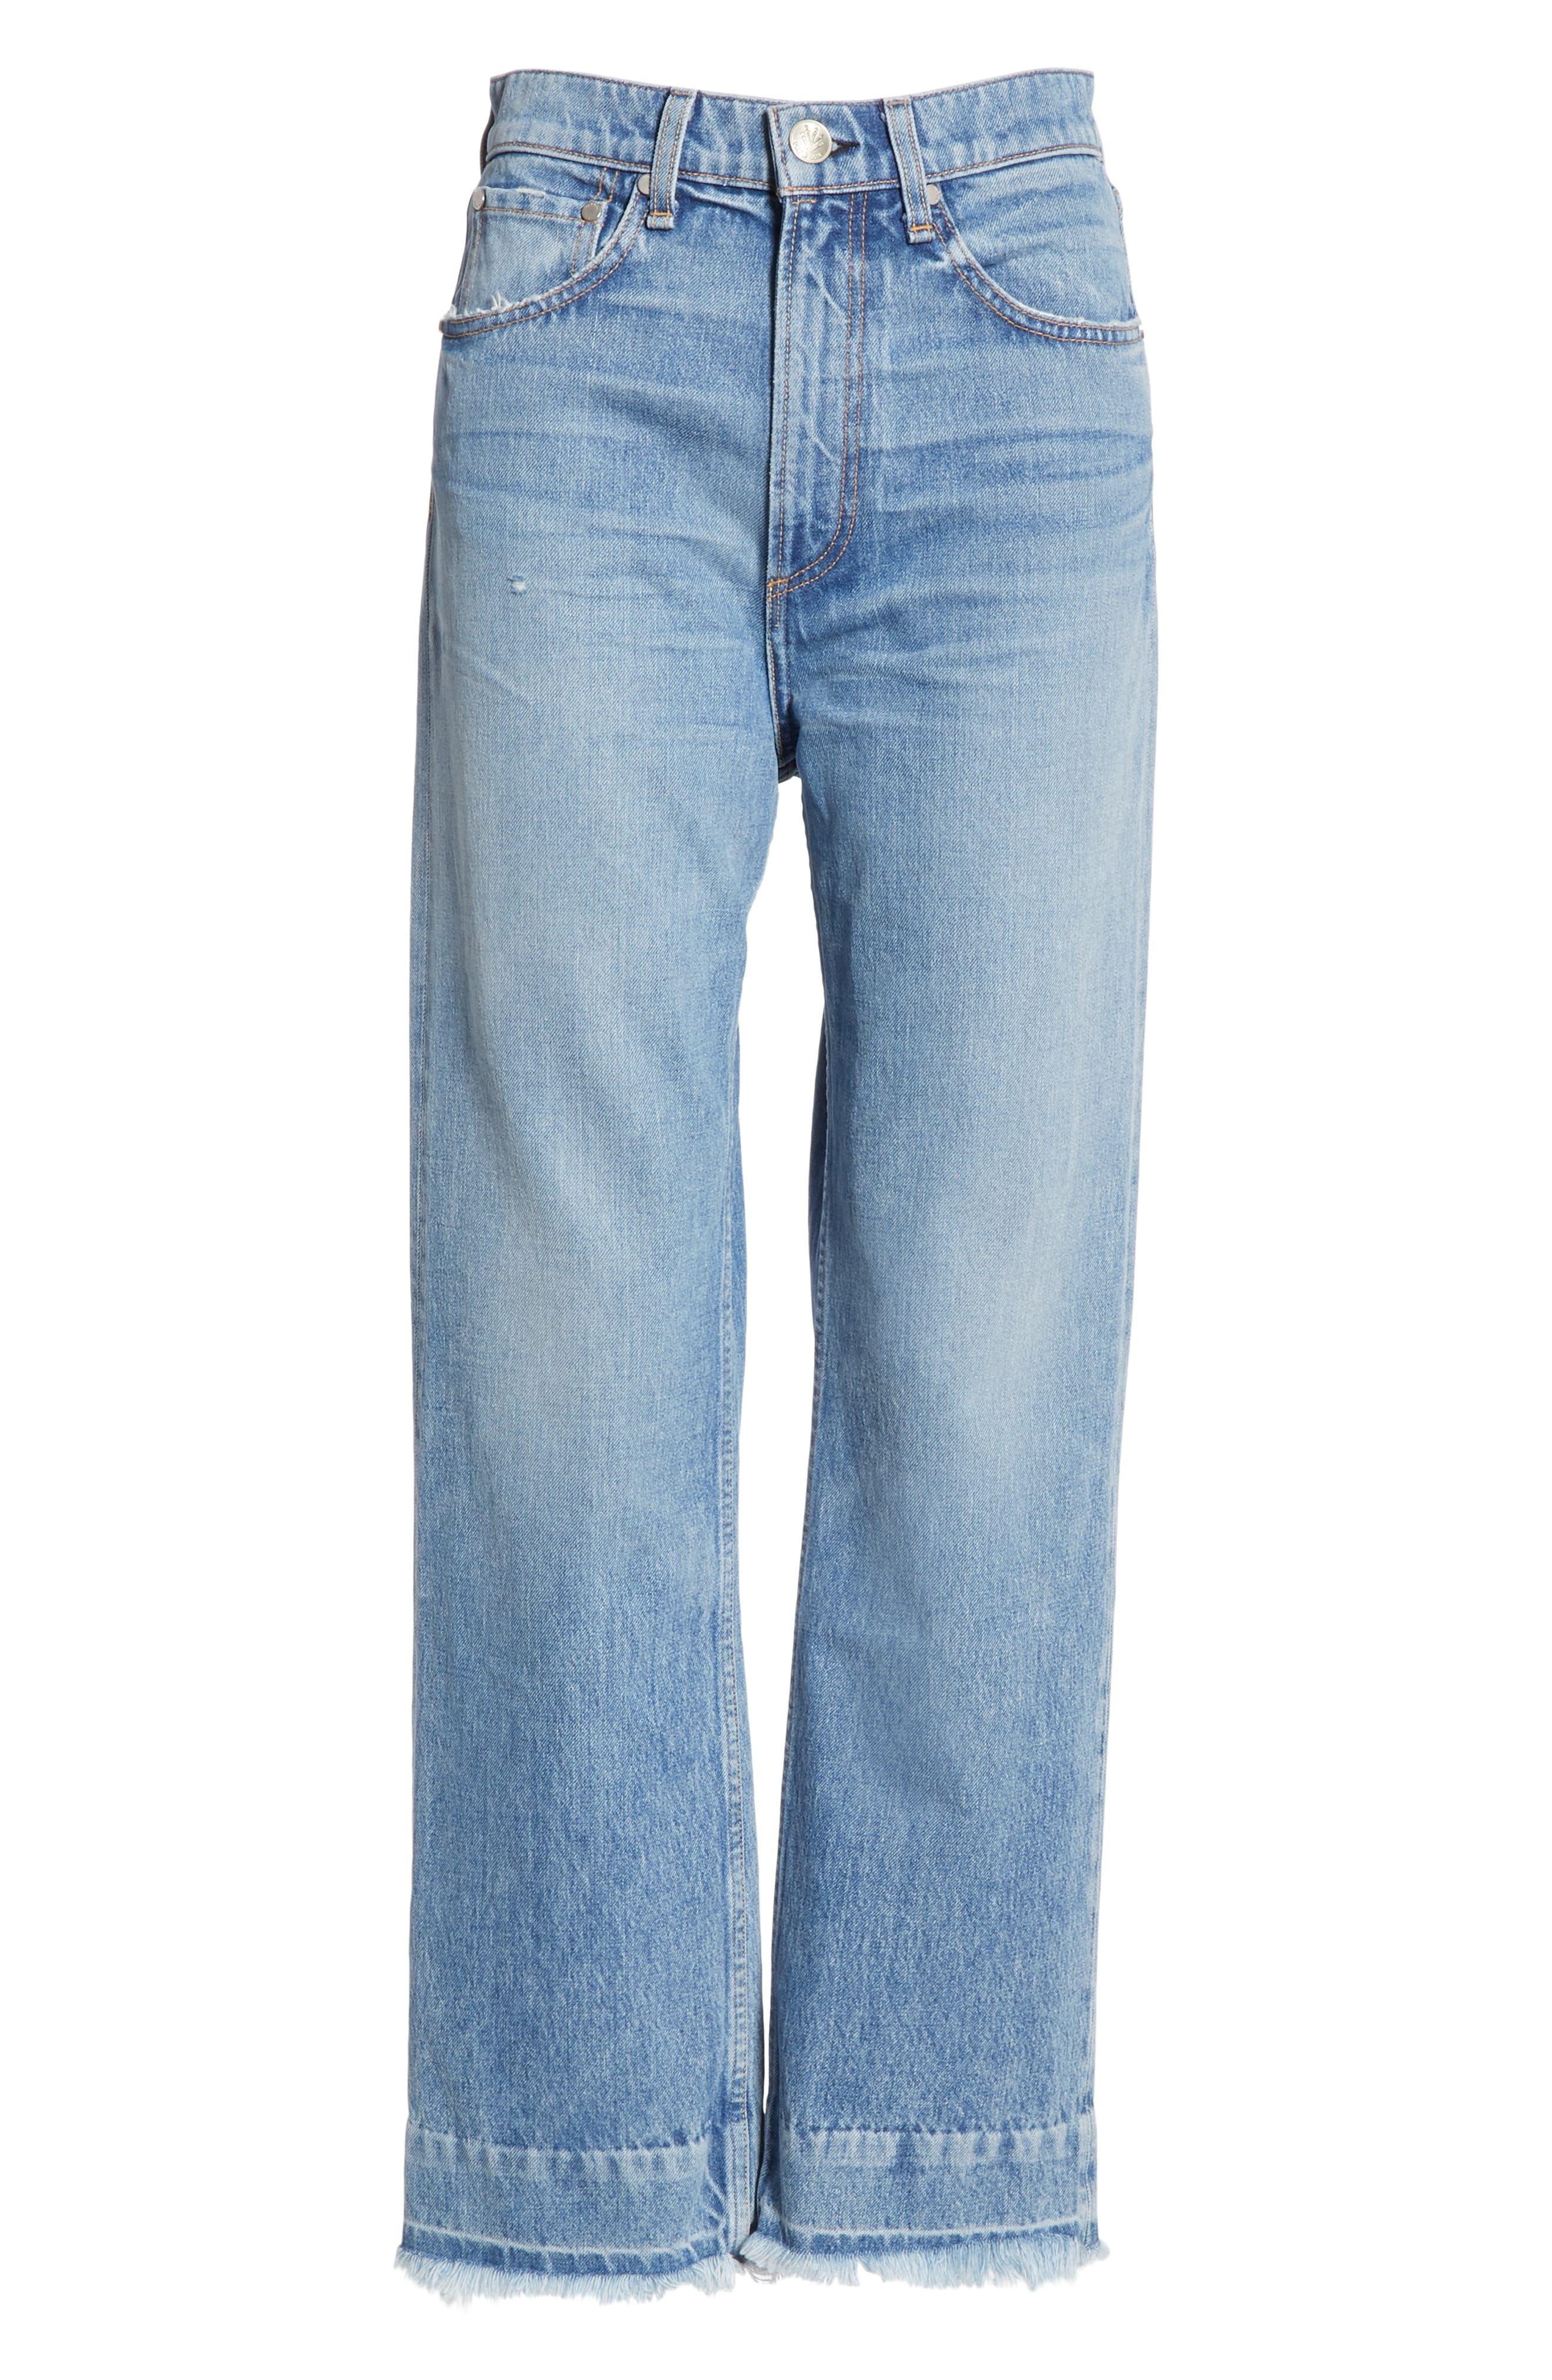 RAG & BONE, Ruth Super High Waist Straight Leg Jeans, Alternate thumbnail 6, color, BABY